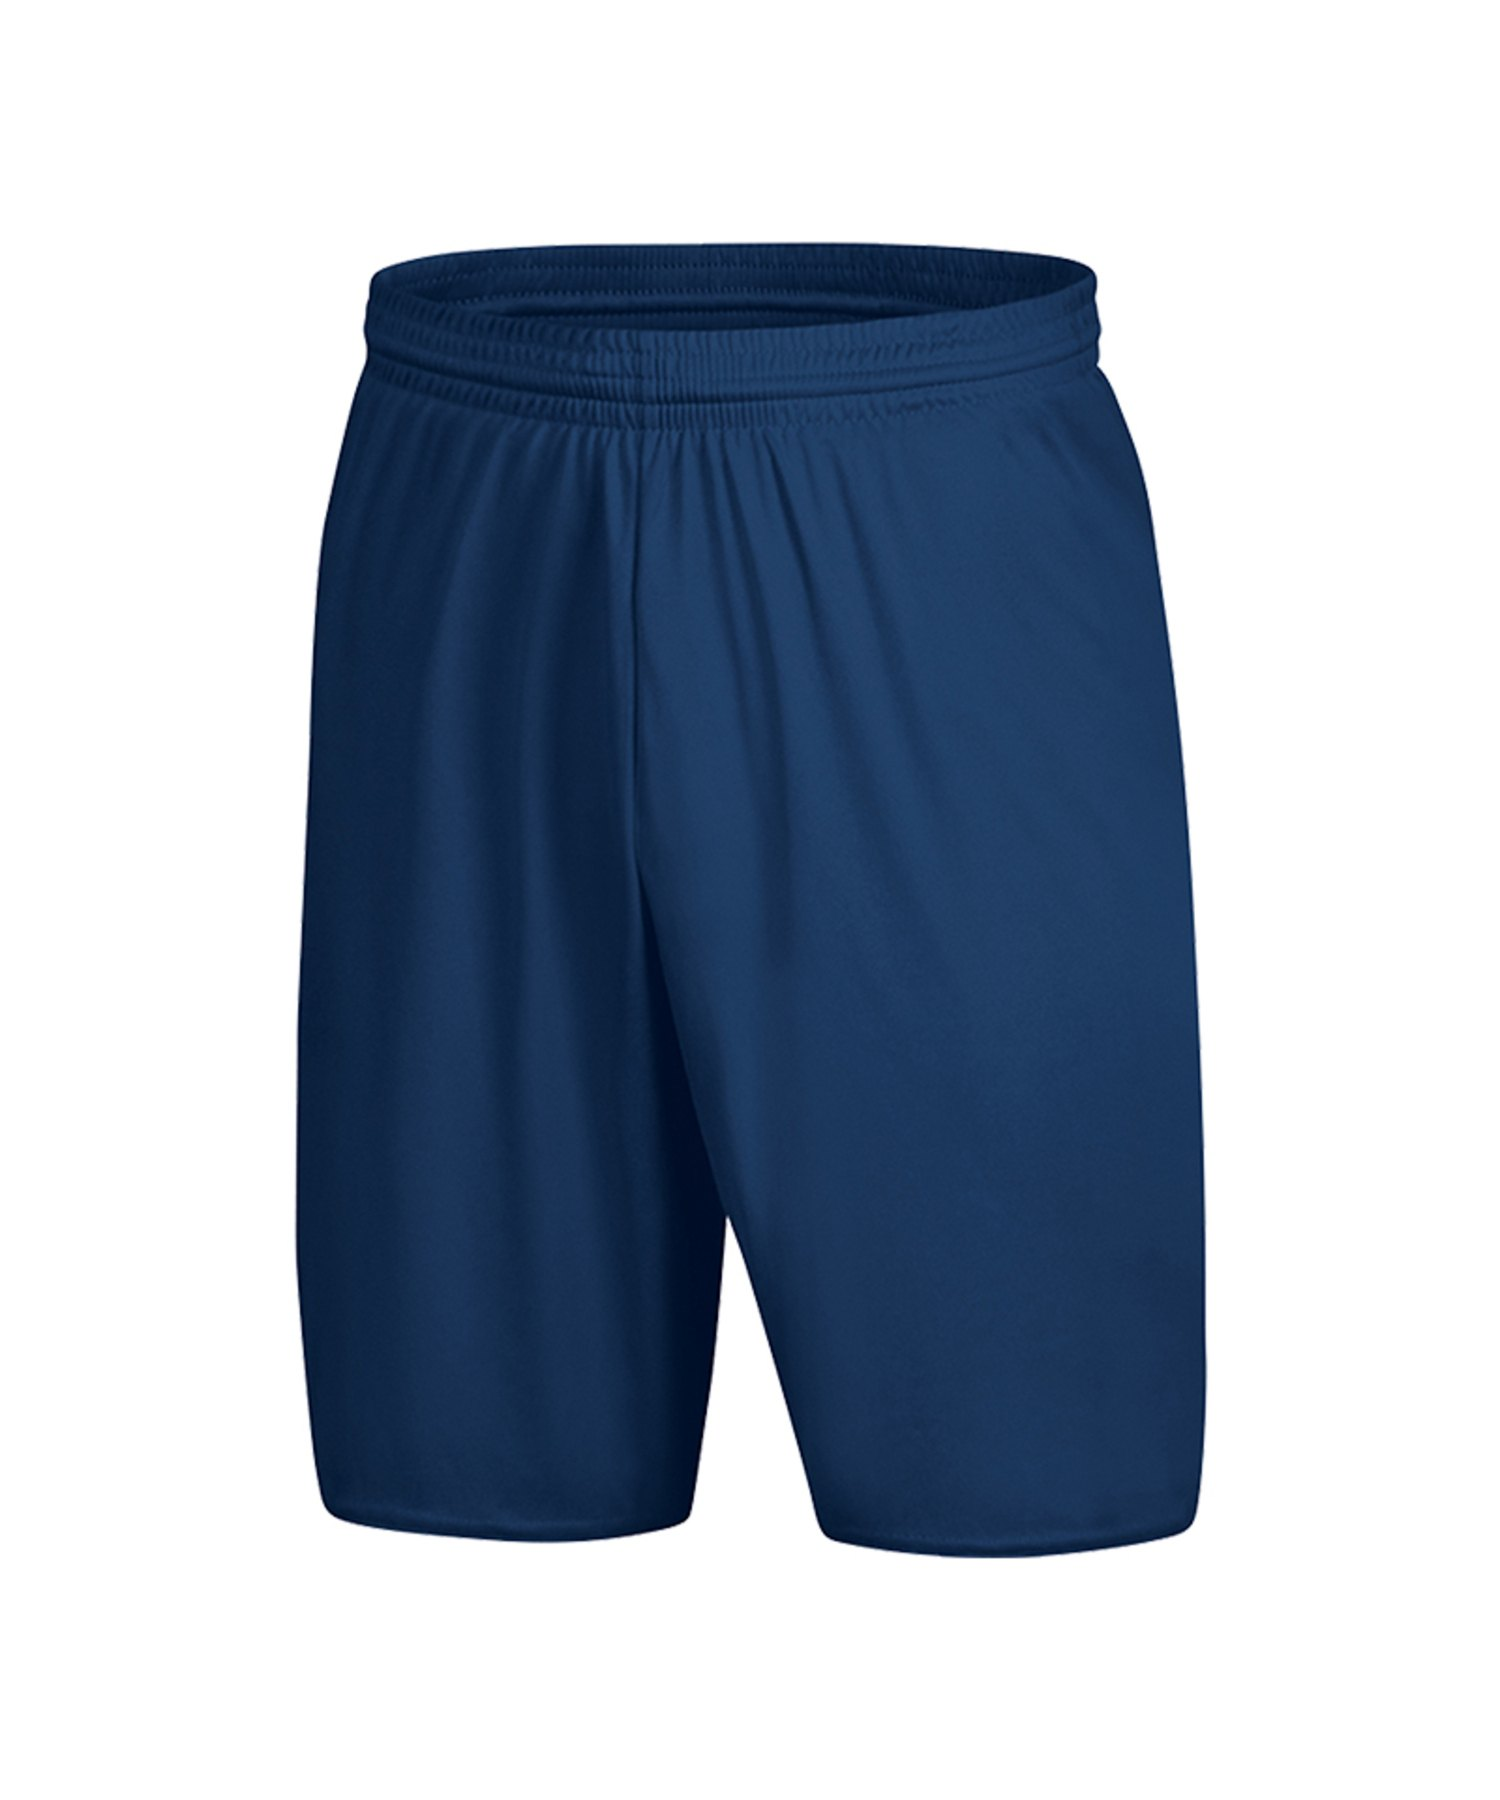 Jako Palermo 2.0 Short Hose kurz Kids Blau F09 - Blau